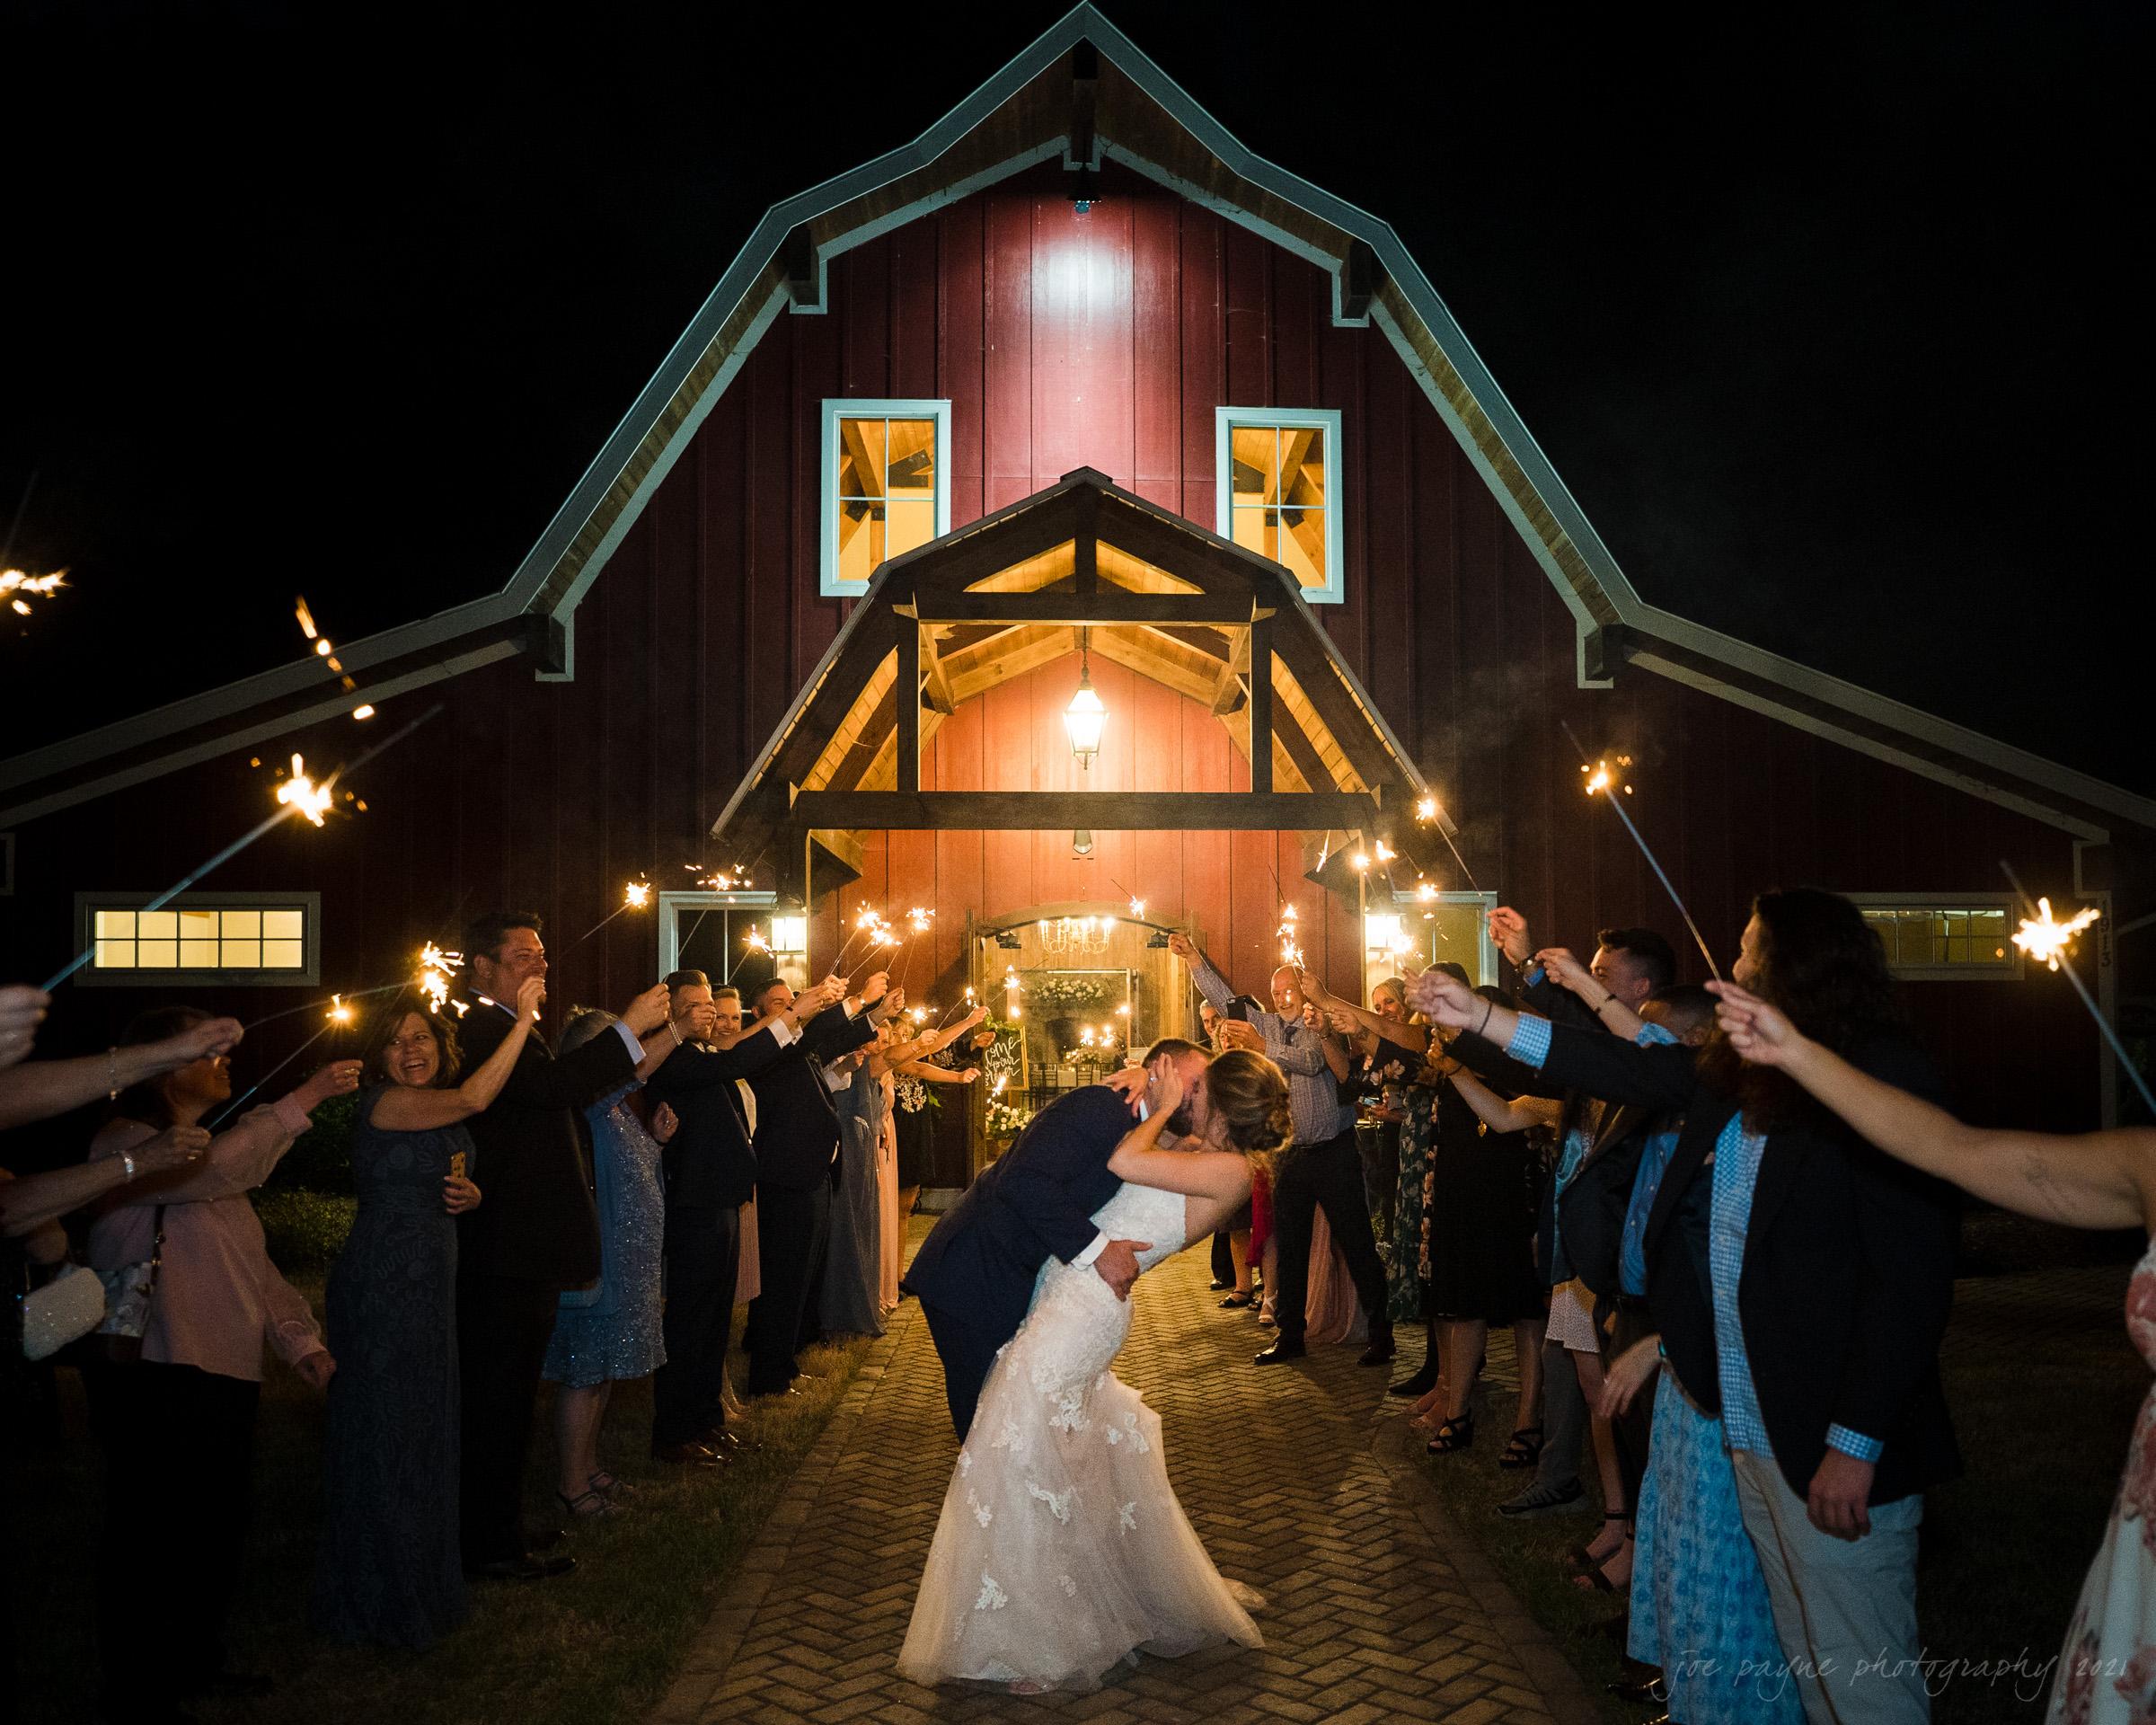 sacred heart church & pavilion at carriage farm wedding sparkler exit kiss